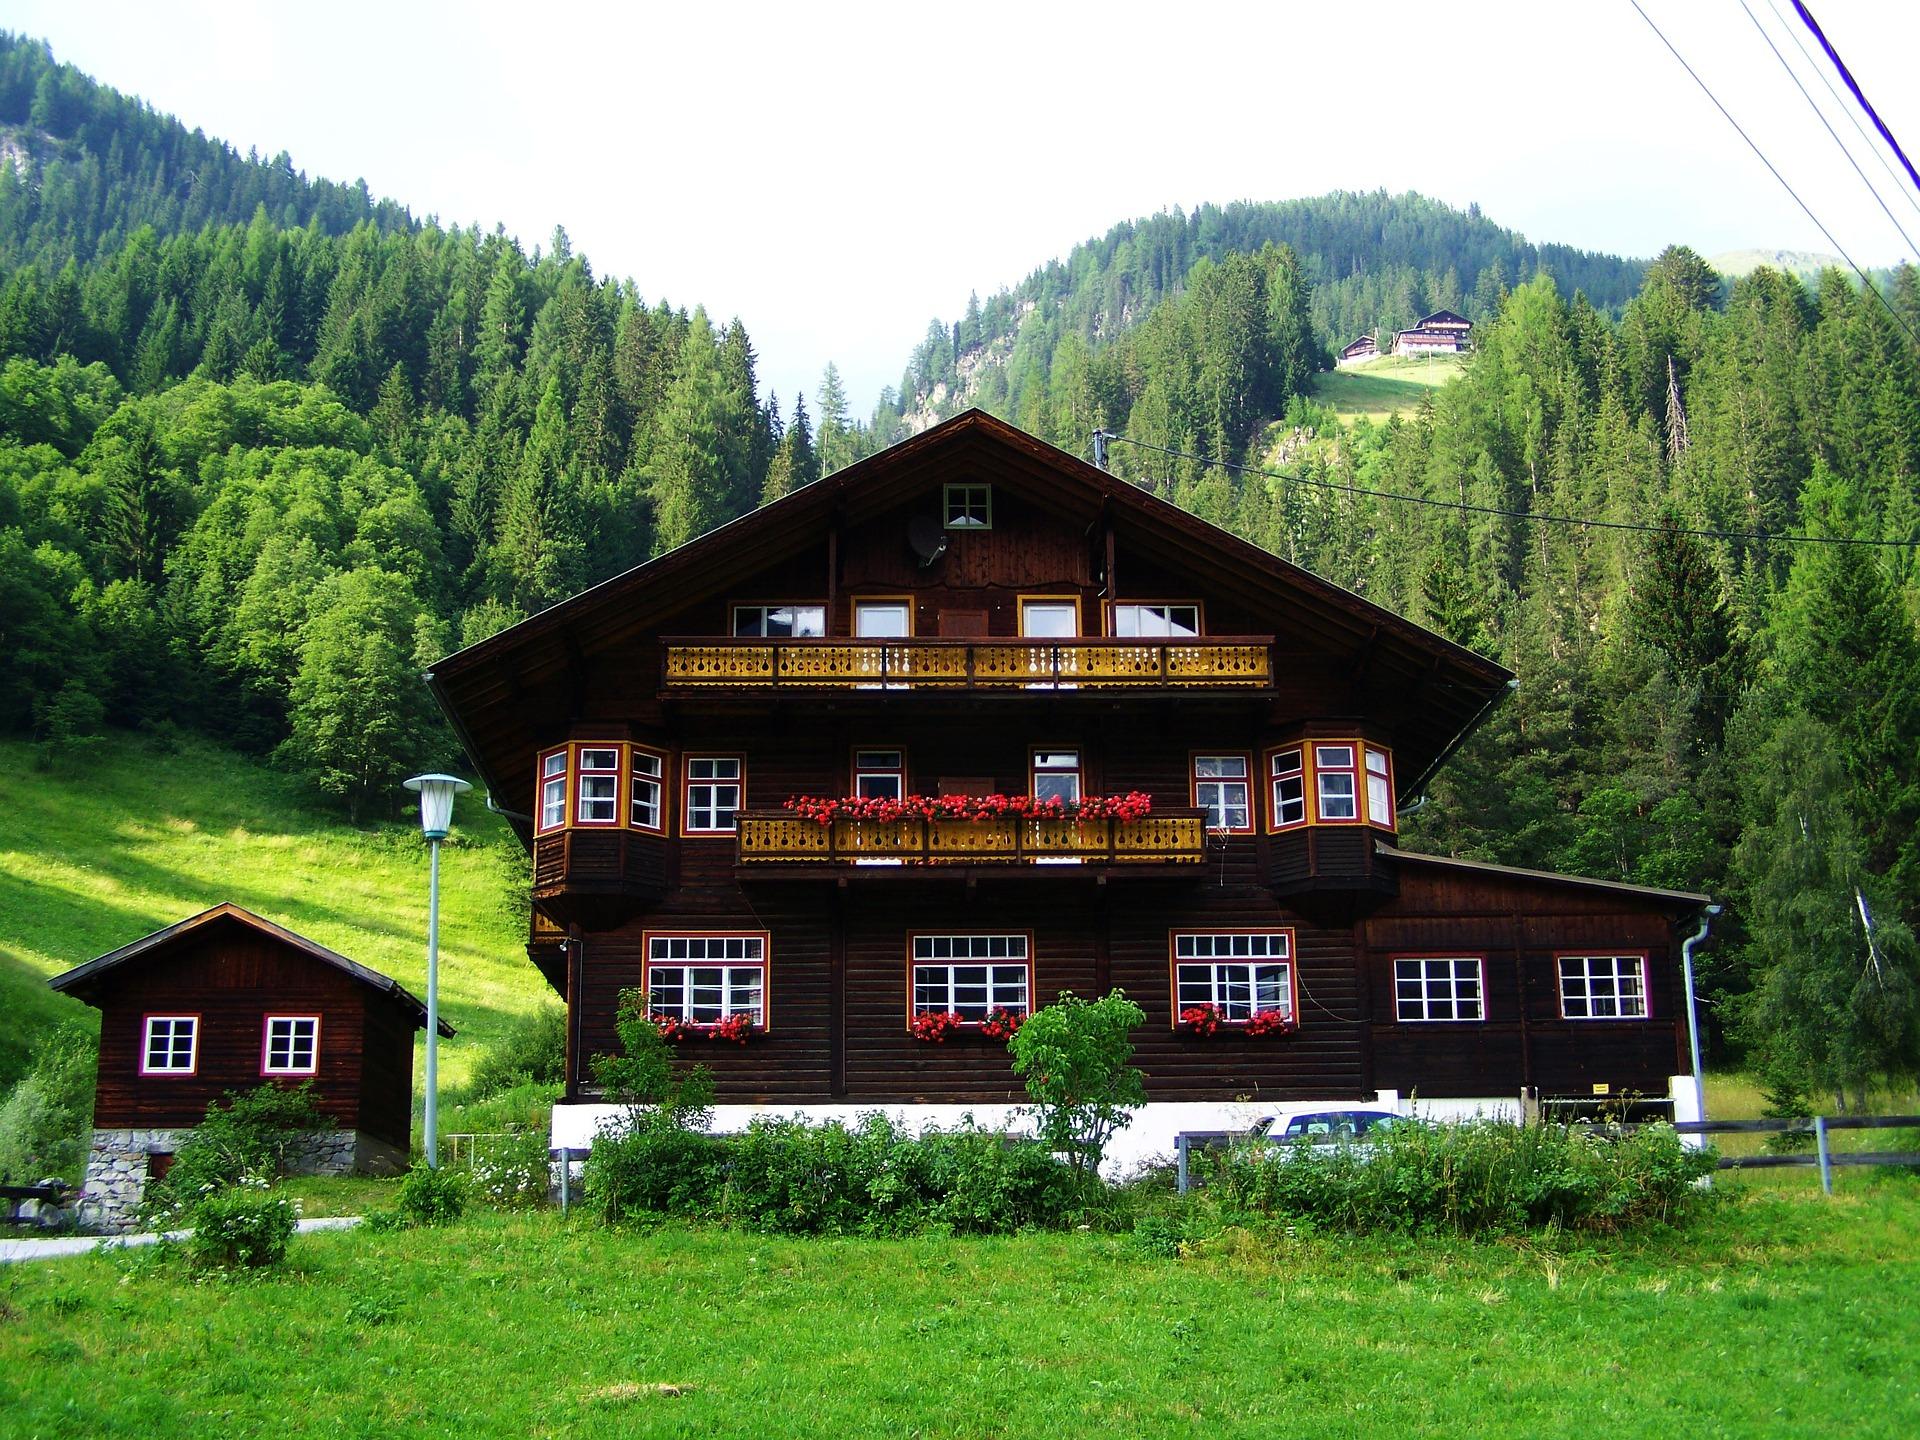 Ubytov 225 N 237 V Horn 237 M Rakousku Informačn 237 Centrum Pro